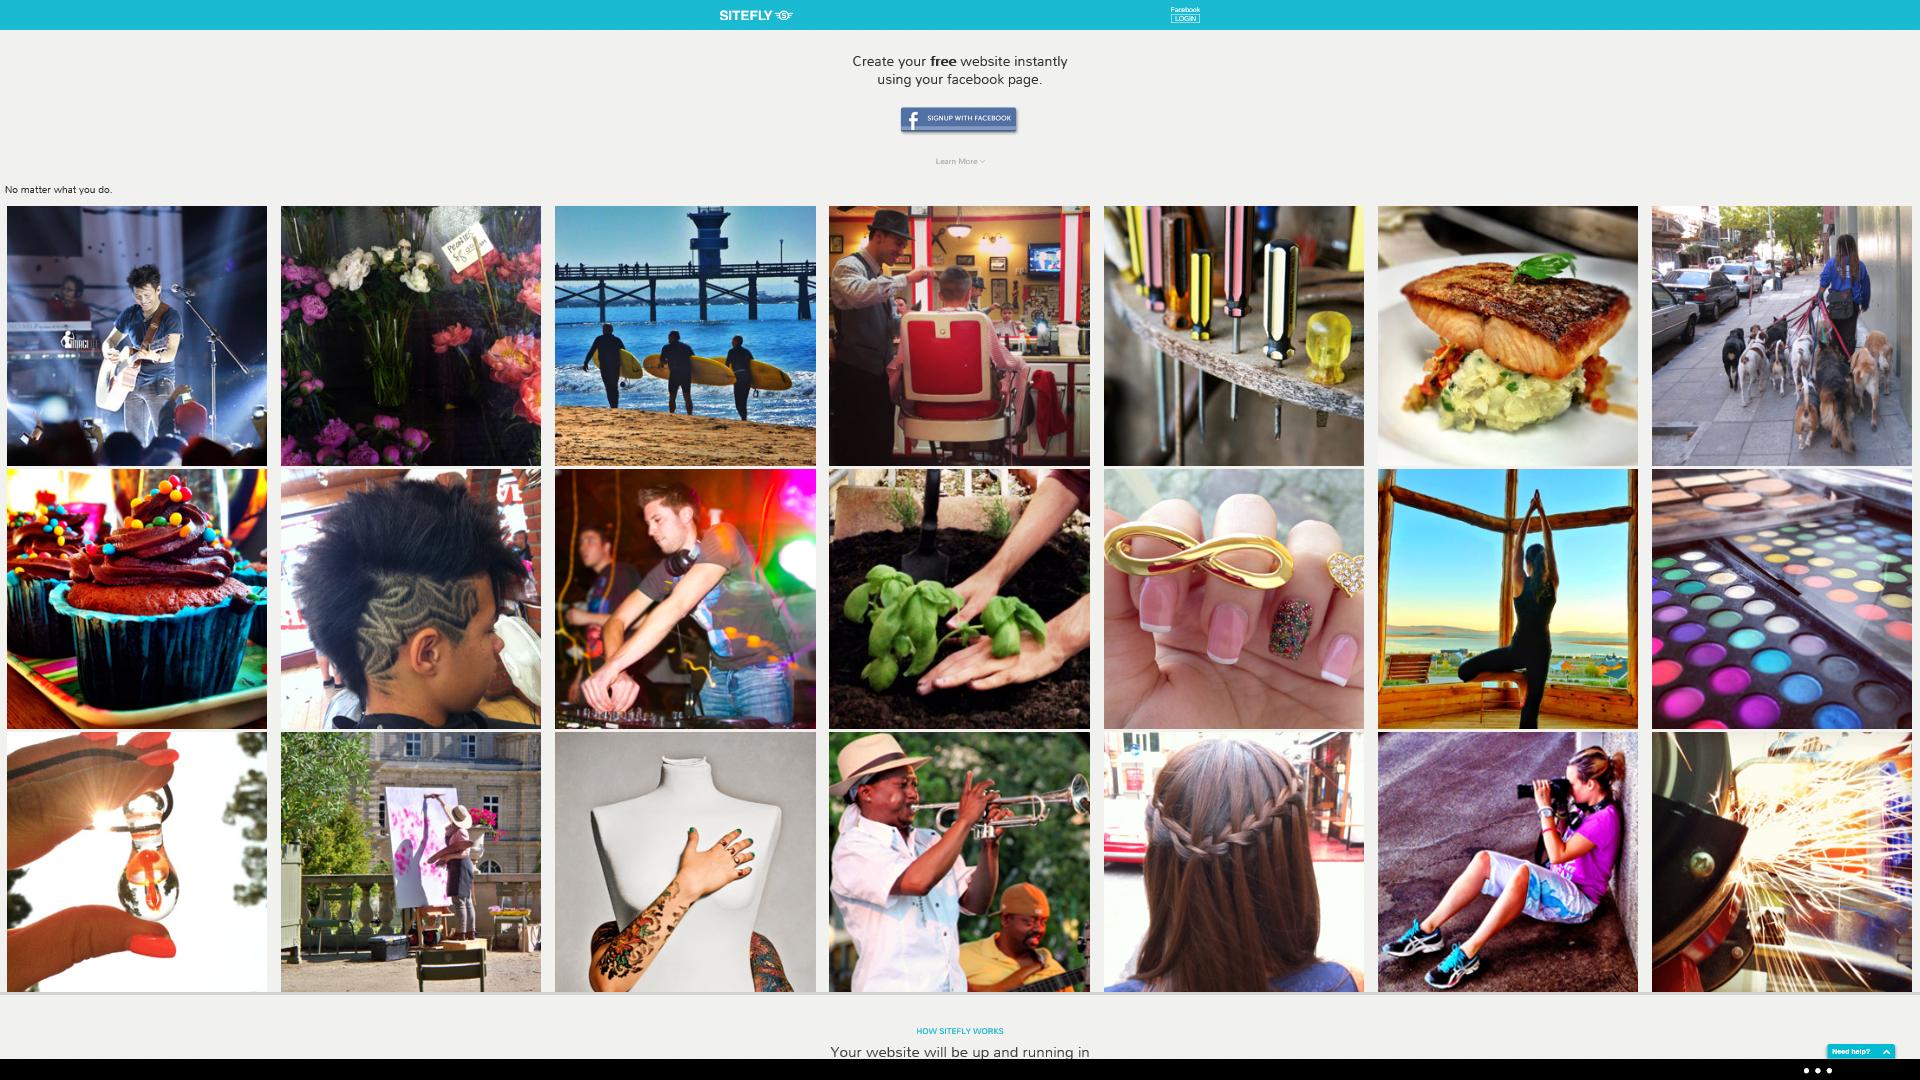 Photo of Sitefly versione 2, riveduta e aggiornata